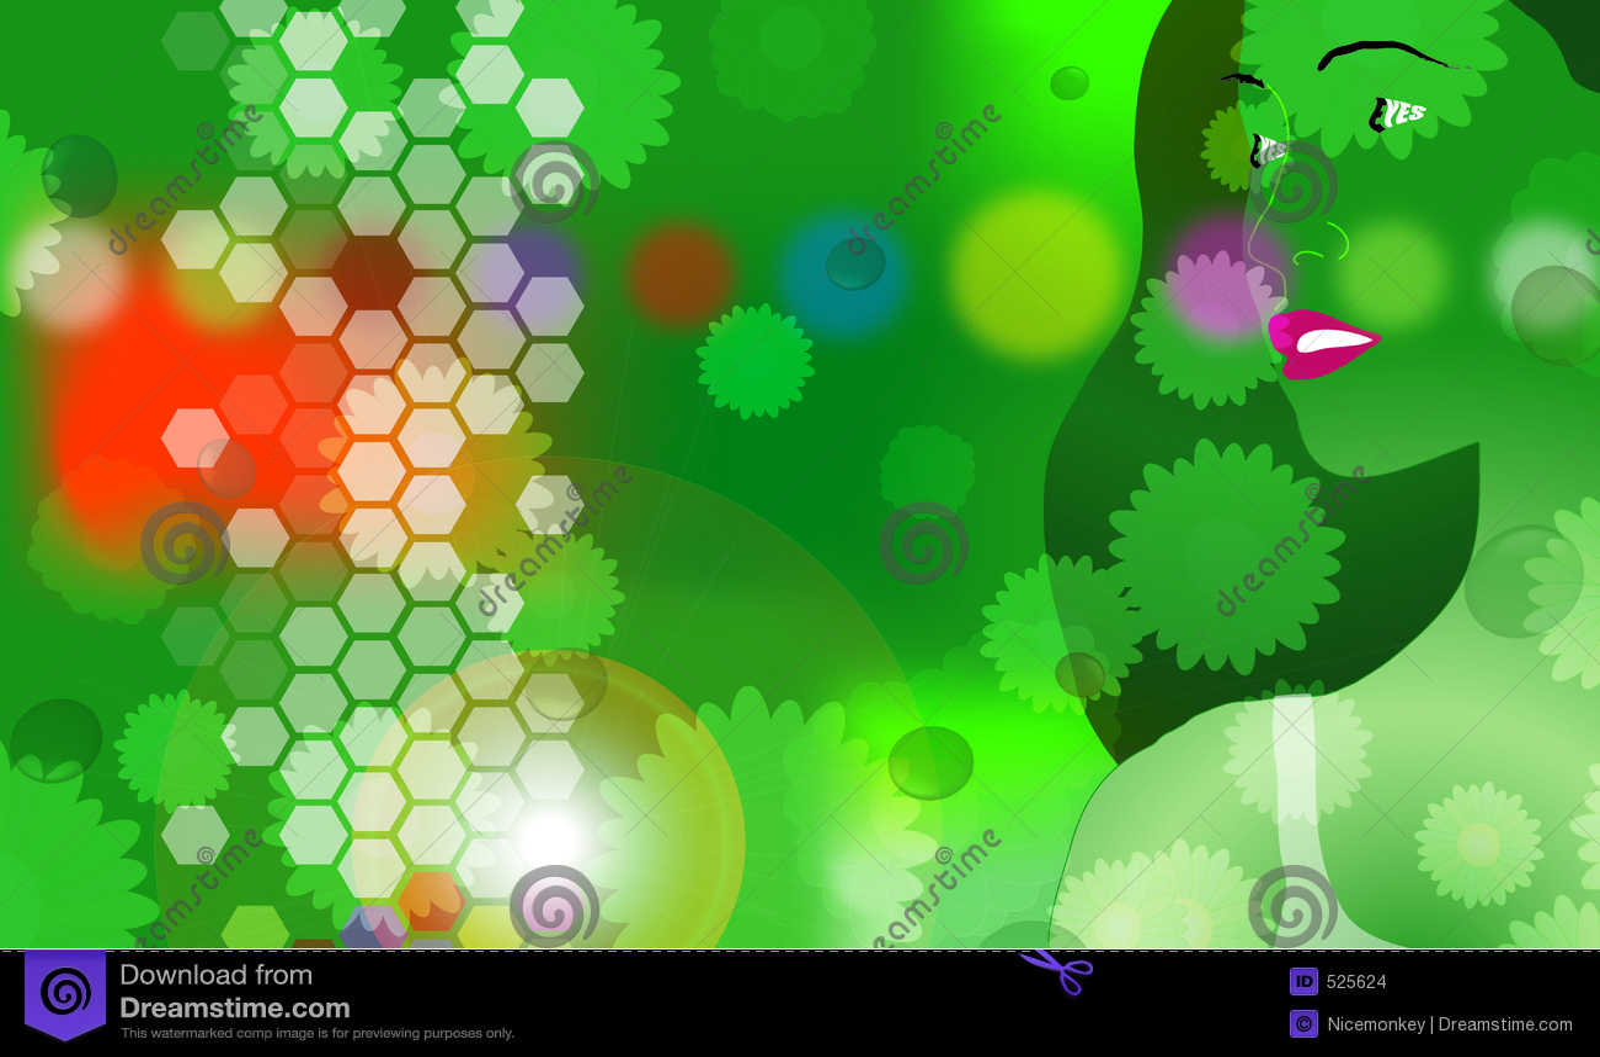 Download 3绿色导致 库存例证. 插画 包括有 注视, 迪斯科, 头发, 微笑, 绿色, 查找, 嘴唇, 凝视, 眼睛 - 525624